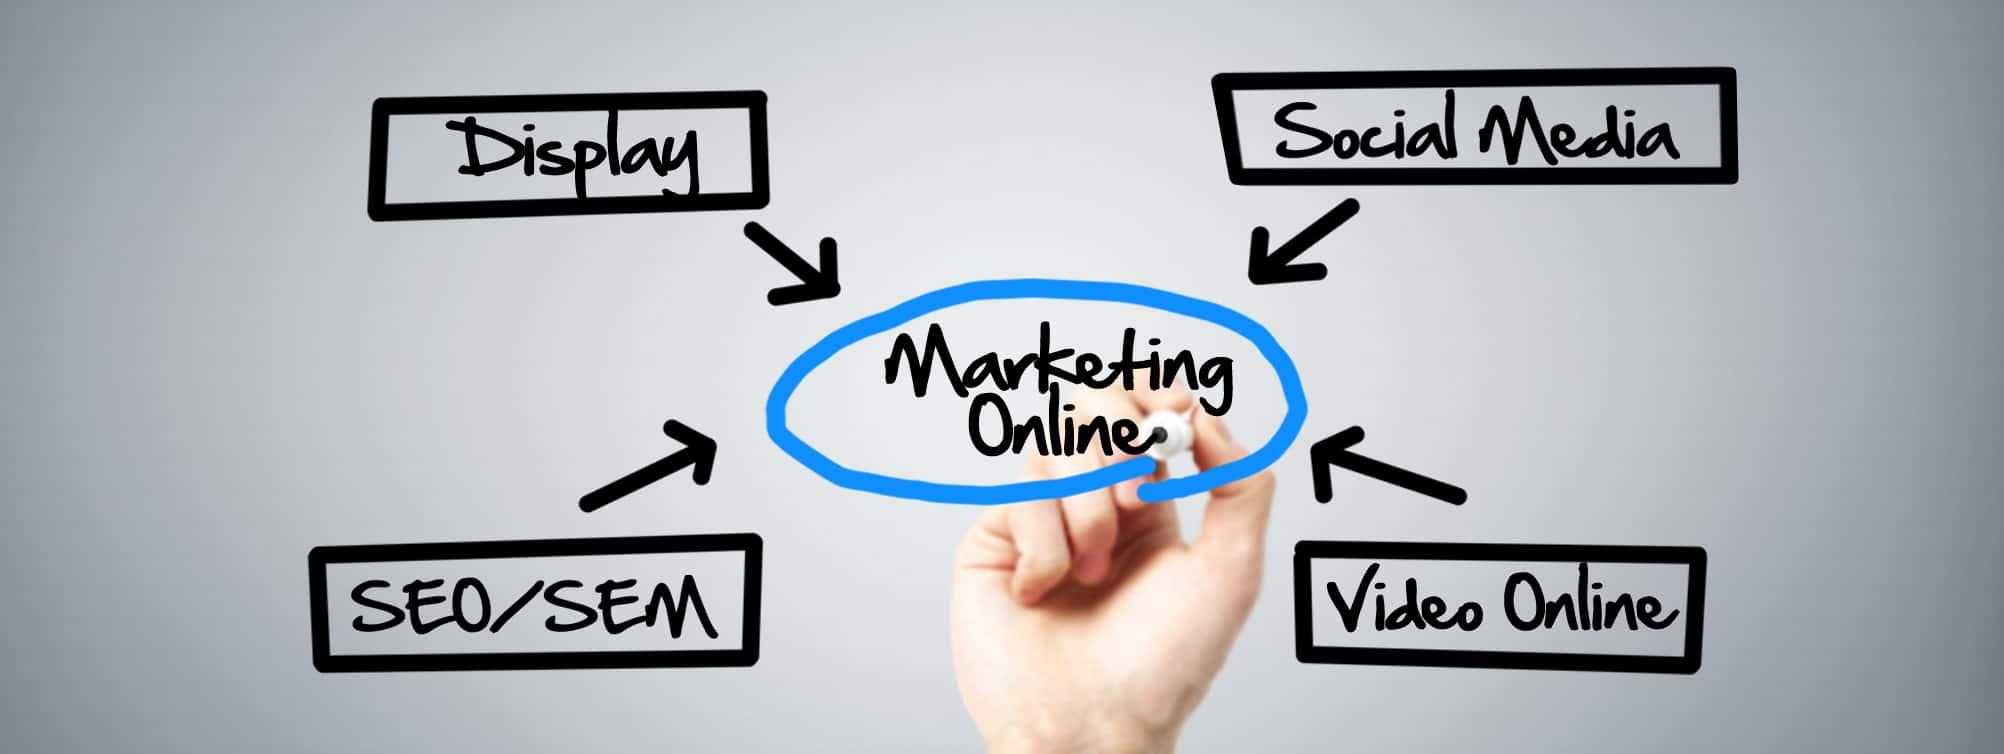 Marketing online valencia